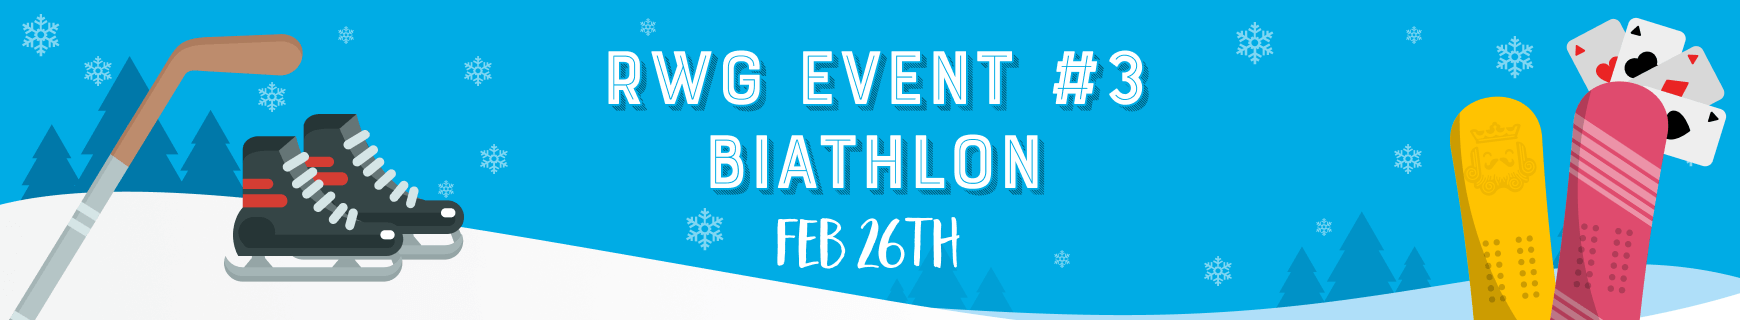 Replay winter games   3   biathlon   dashboard %28870 x 160%29 x2